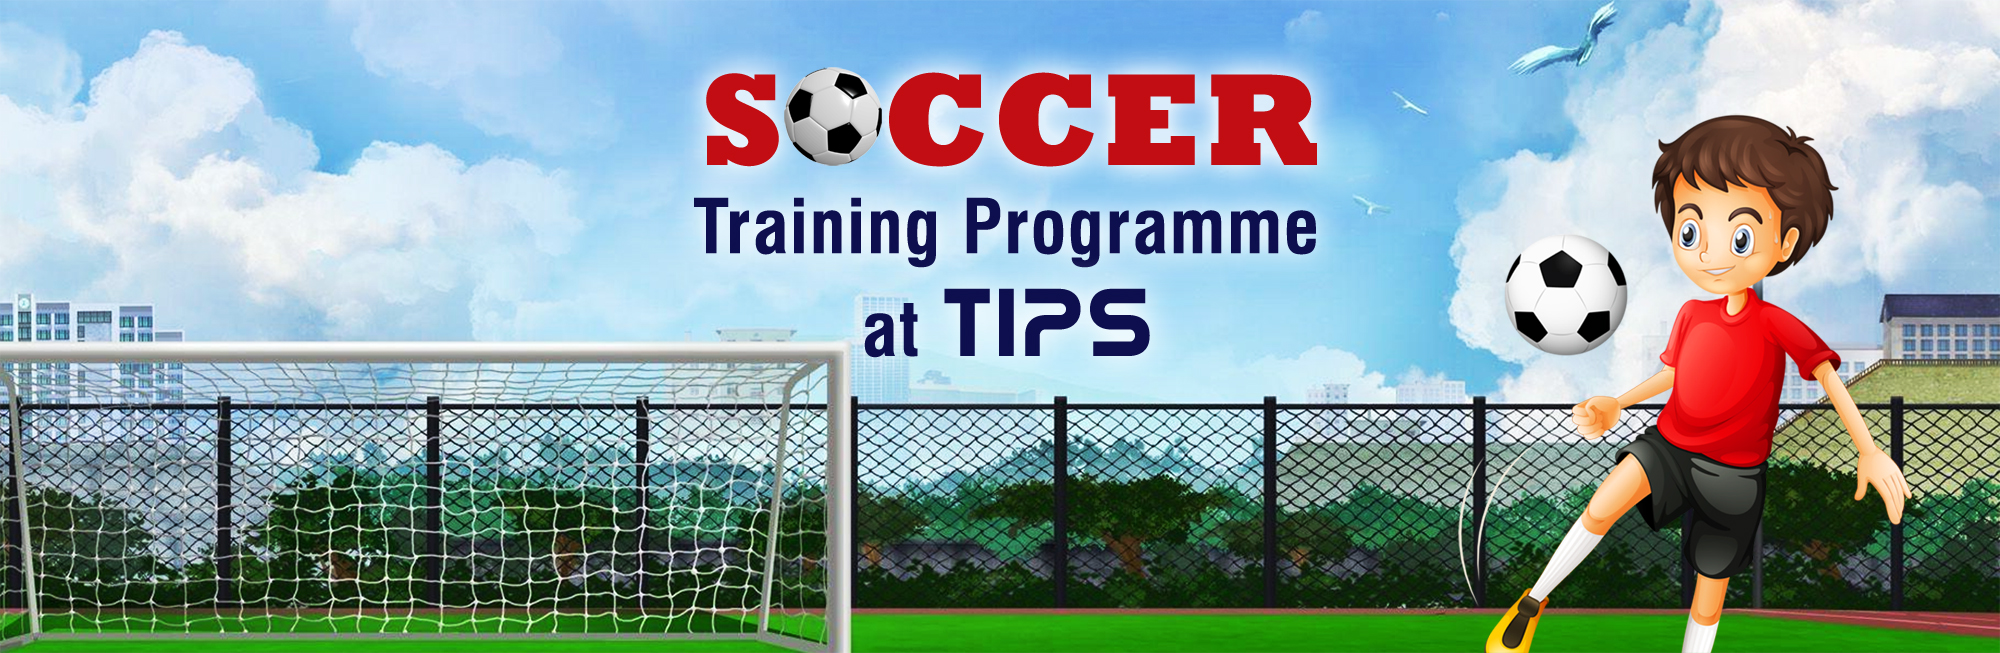 Soccer Training Programme at TIPS Blog